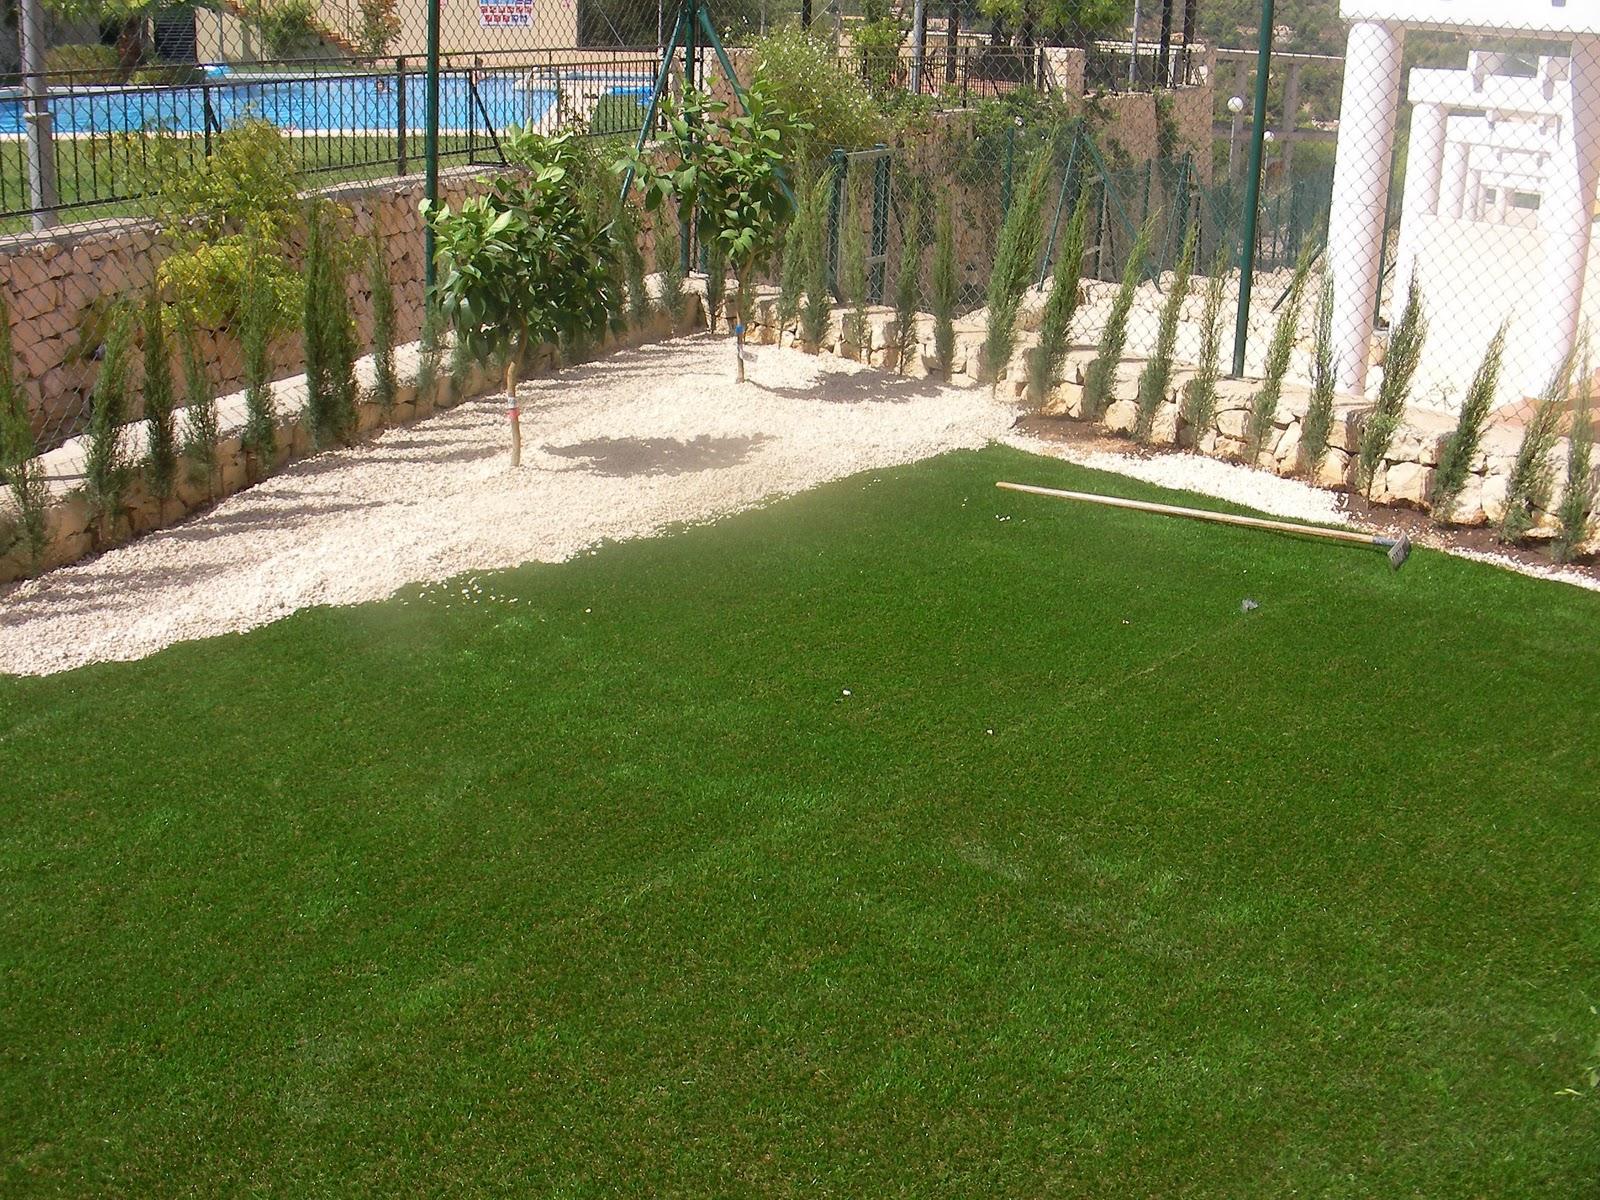 Ideagarden jardin con cesped artificial en calpesol - Jardin con cesped artificial ...